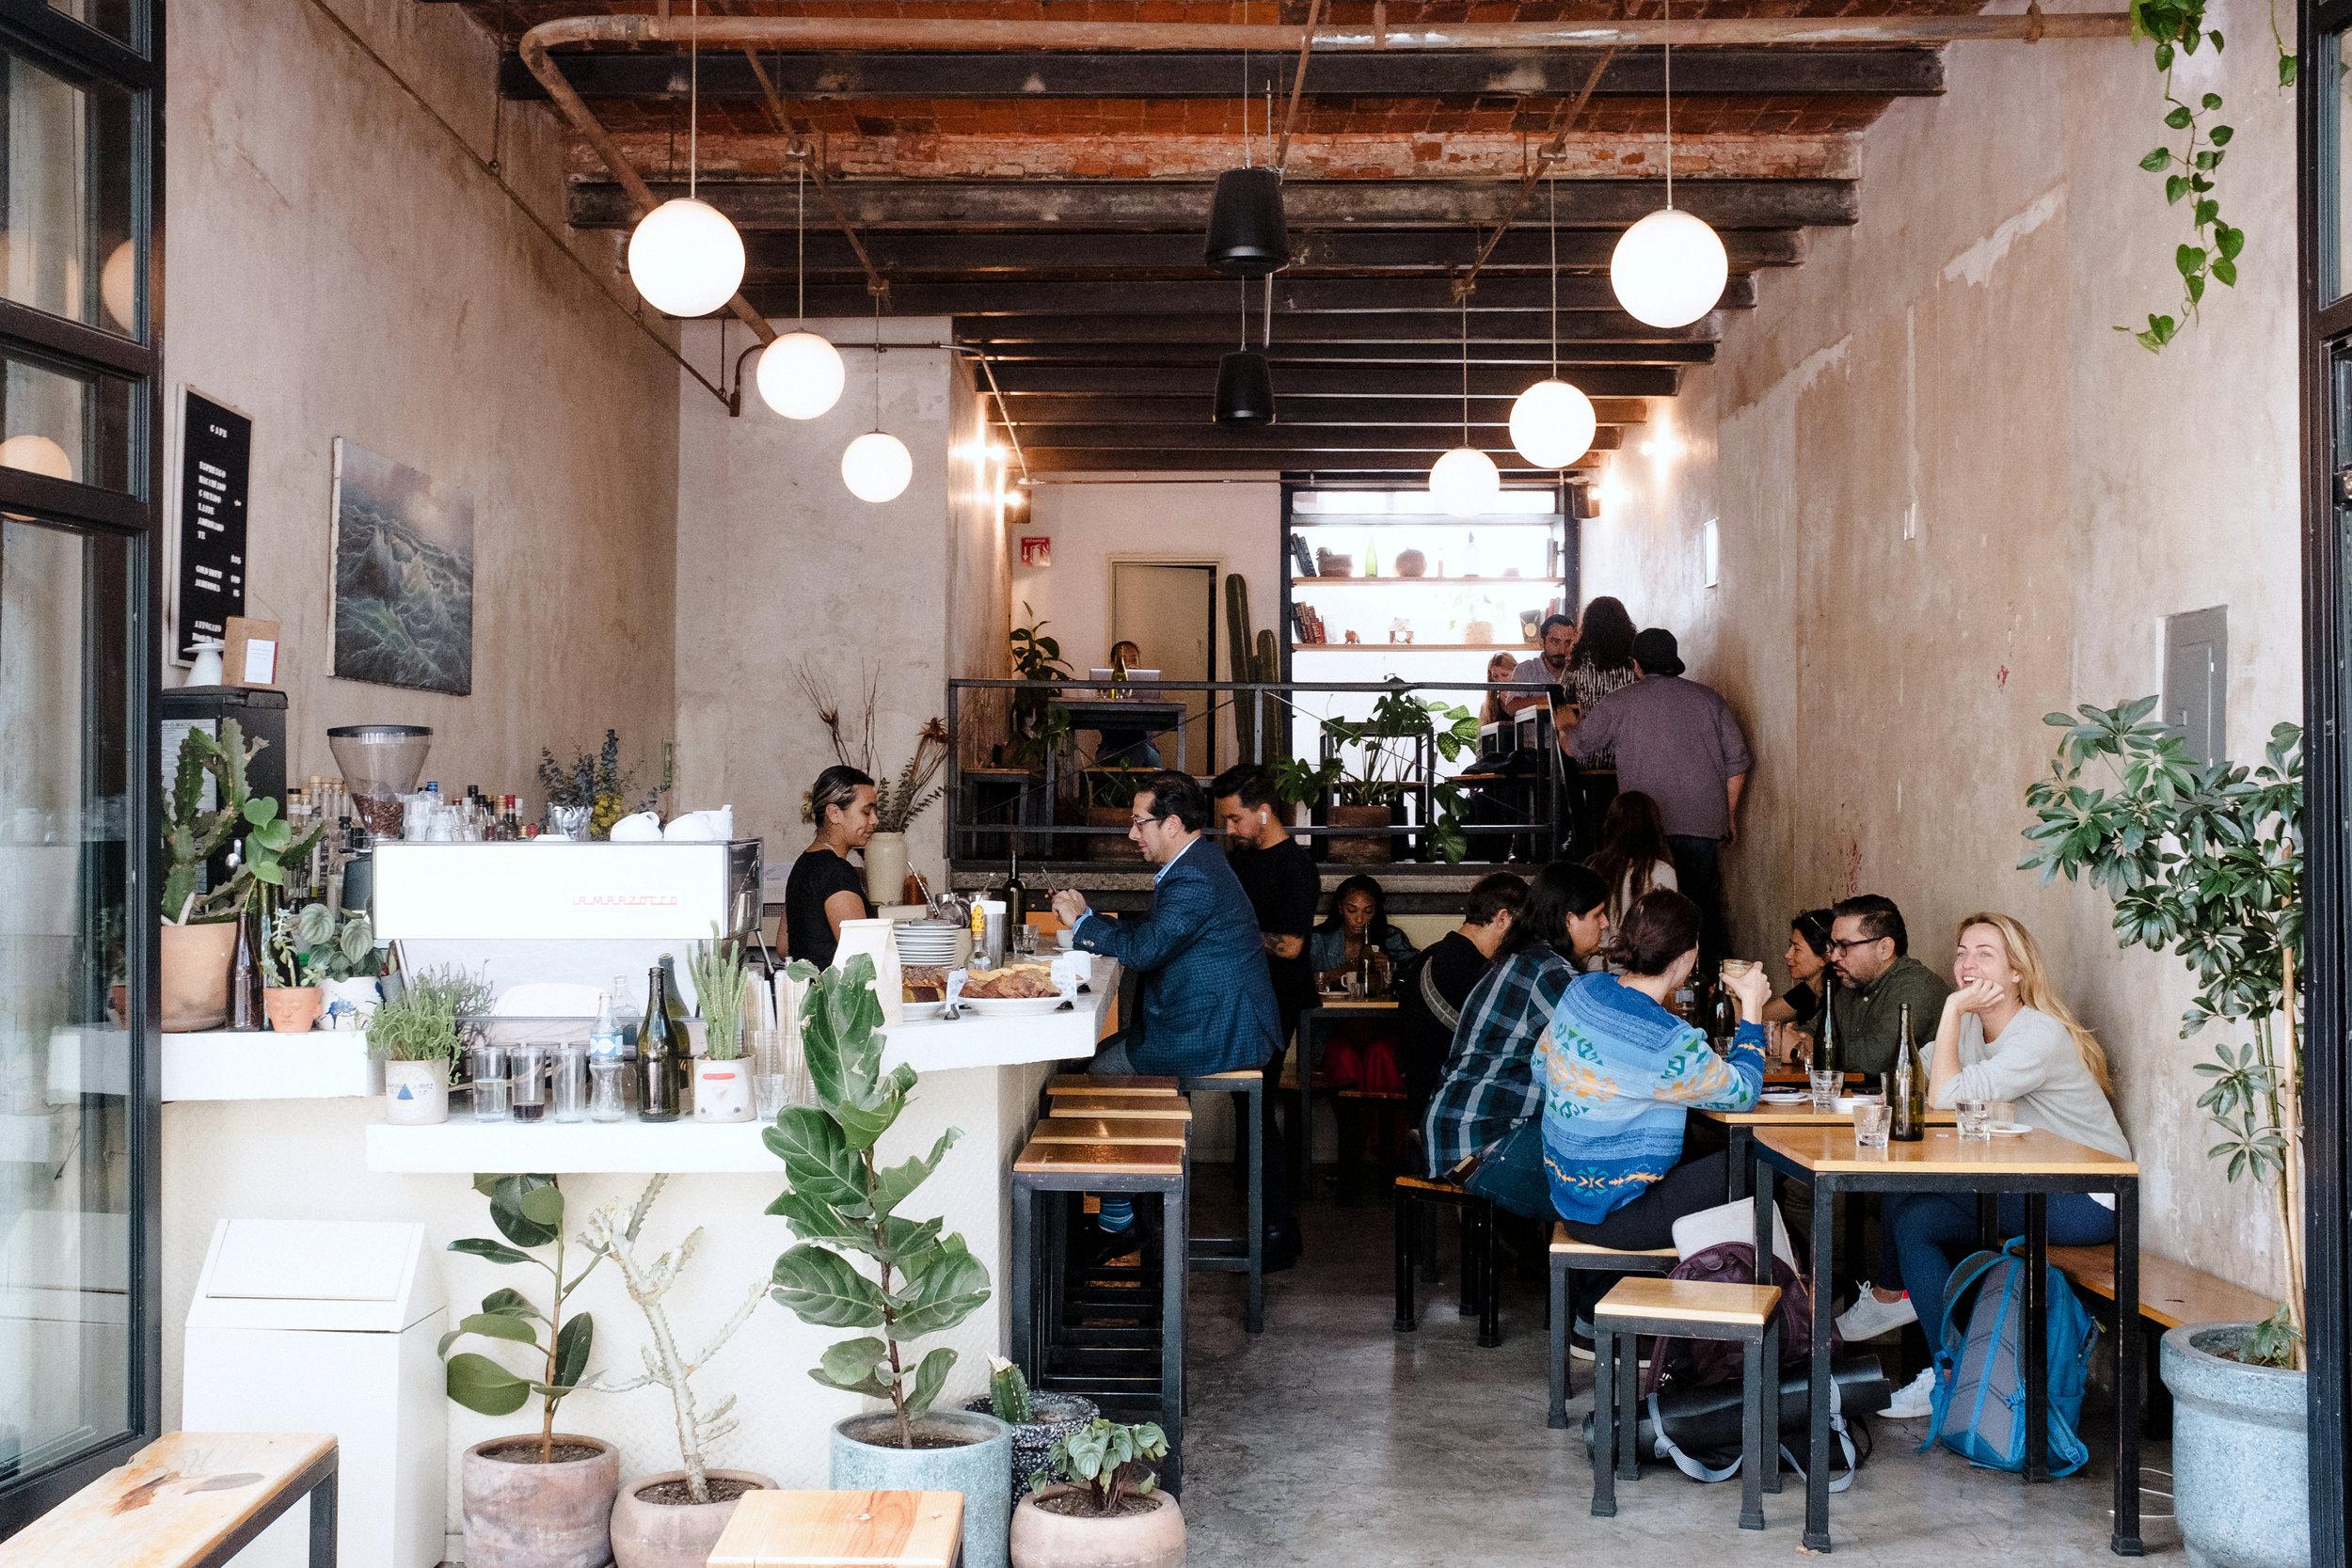 cicatriz cafe mexico city